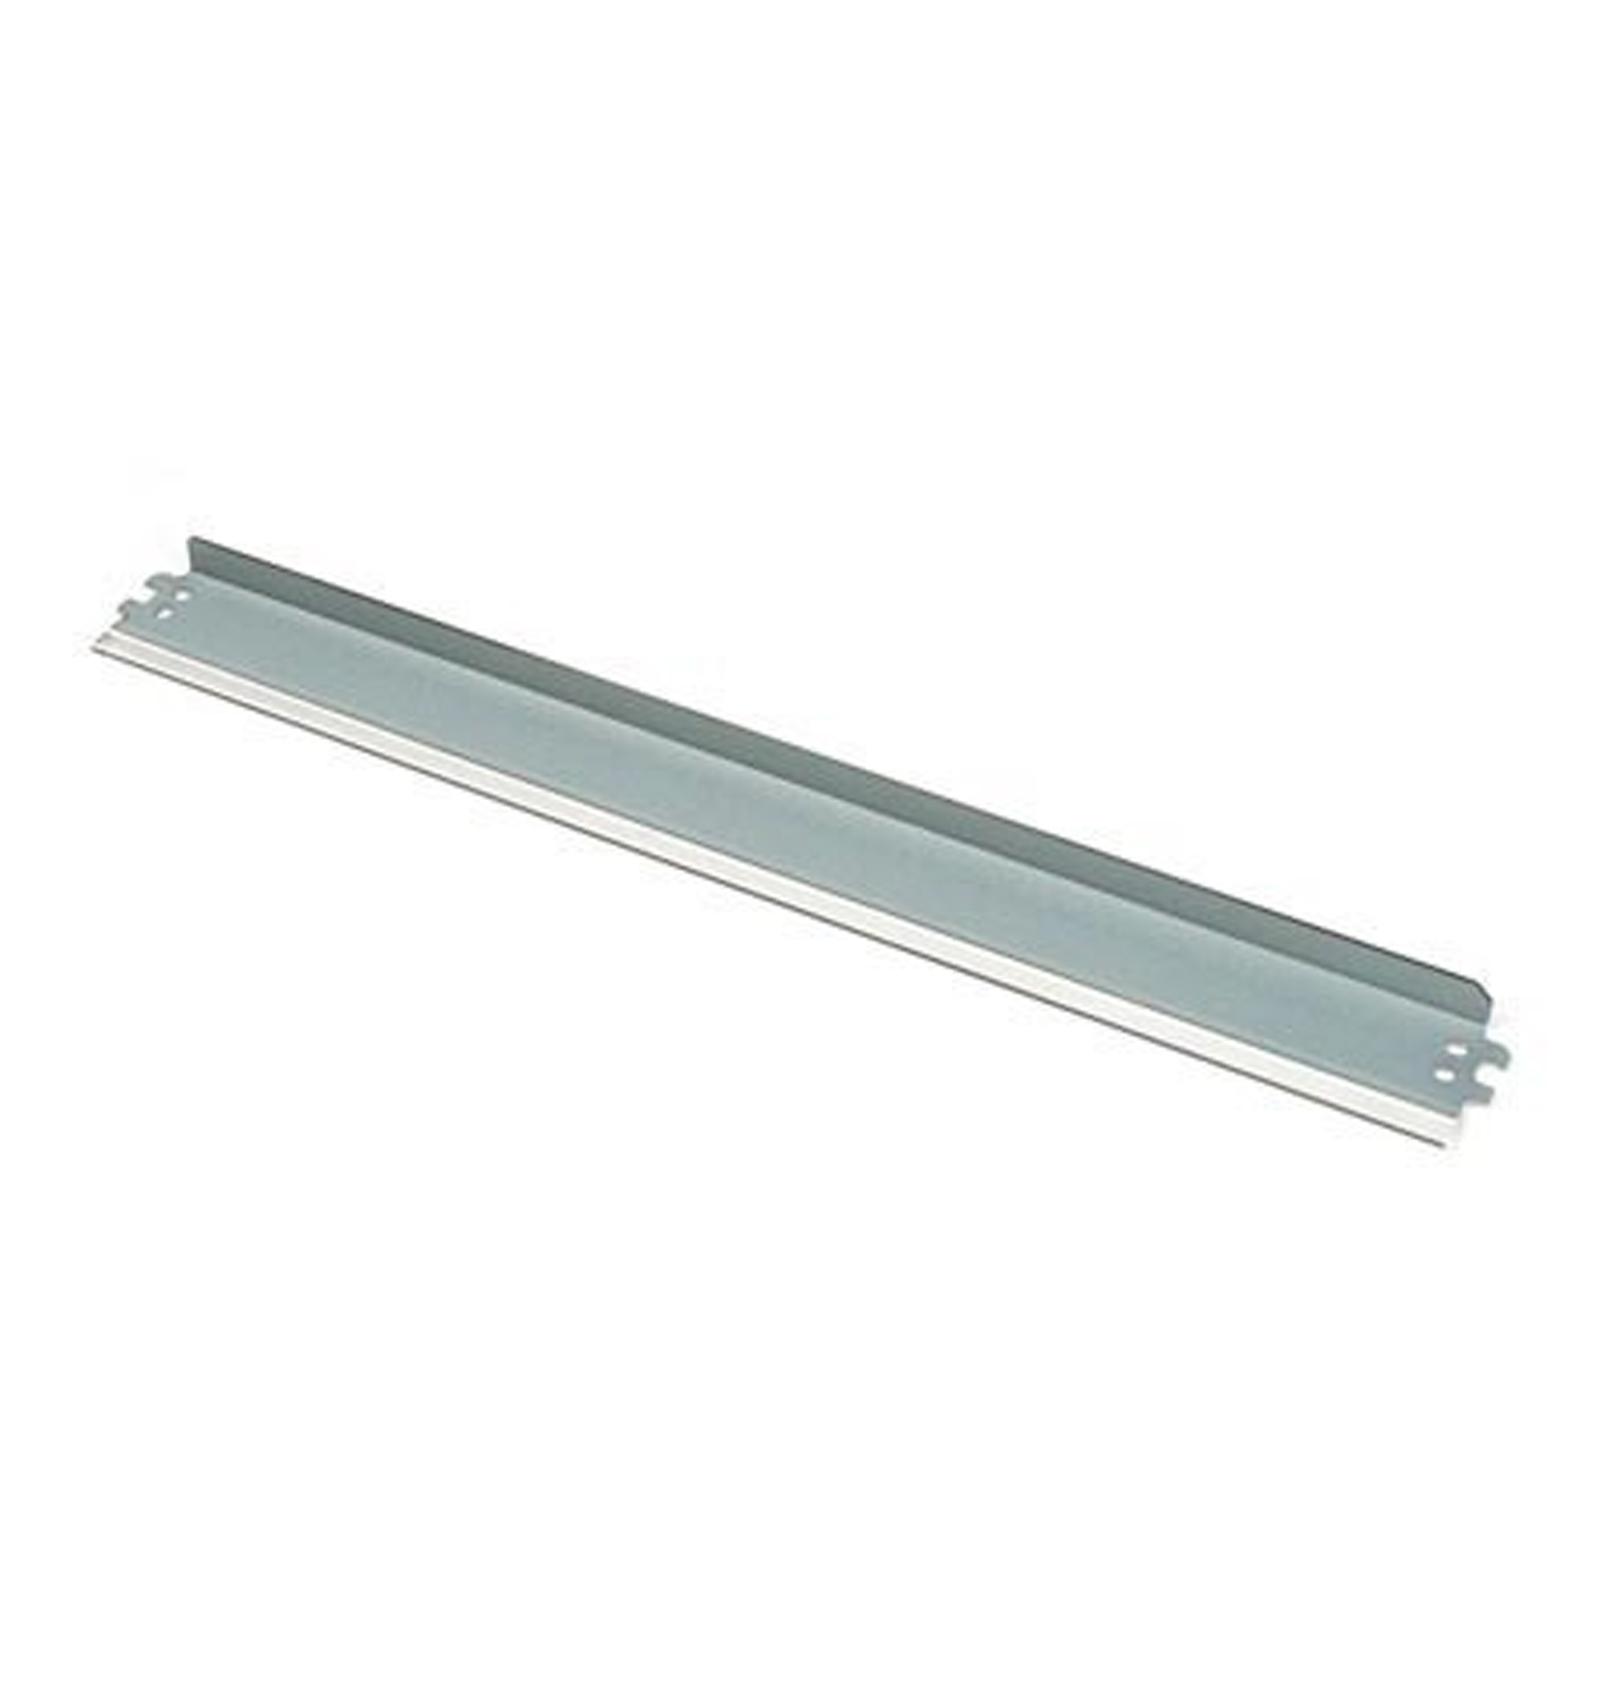 Замена ракеля картриджа HP C4092A (92A) для LaserJet 1100/3200/3220